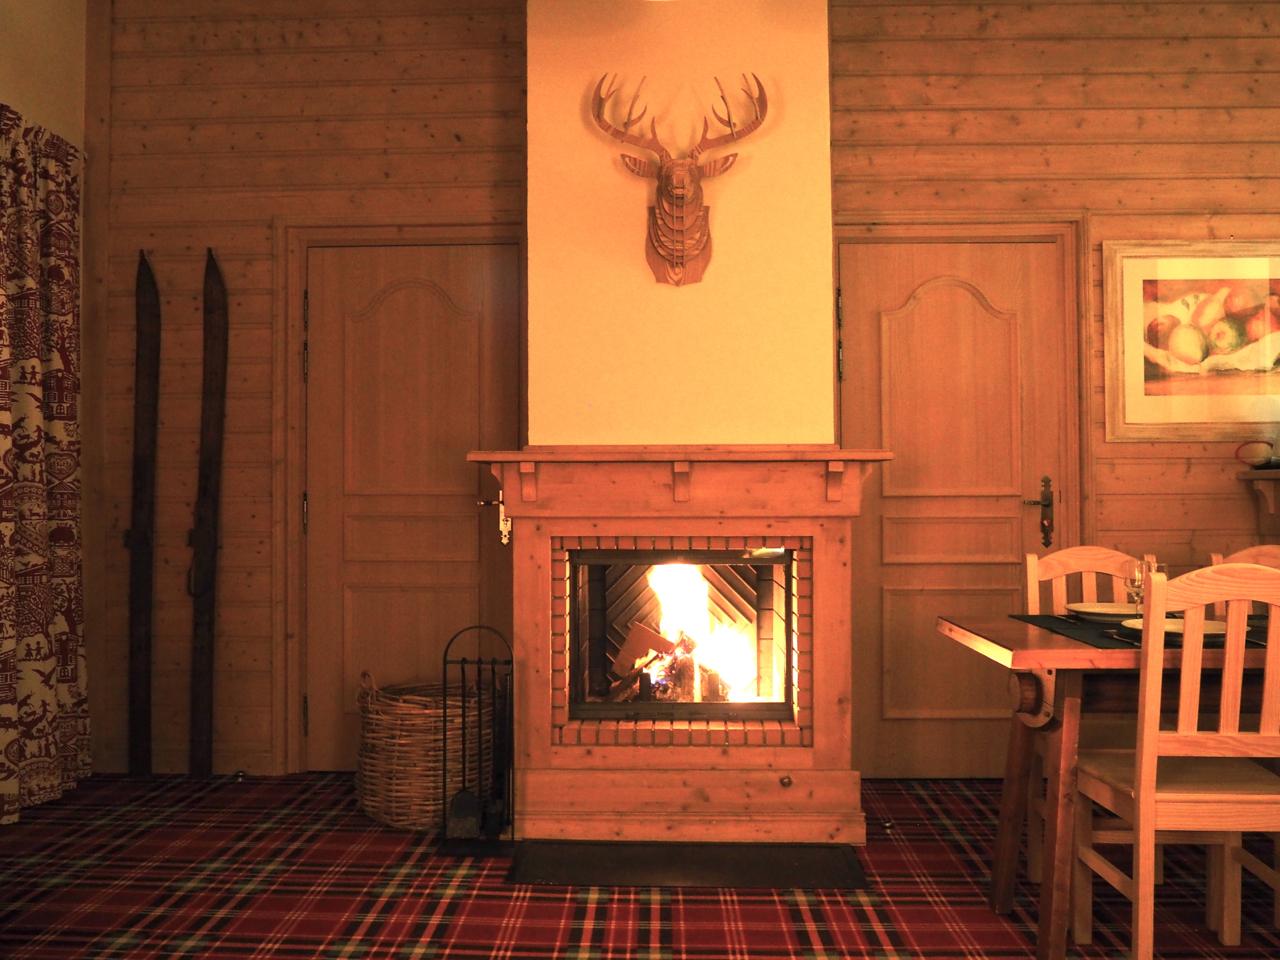 3 salon cheminee 2 arc 1950 direct. Black Bedroom Furniture Sets. Home Design Ideas